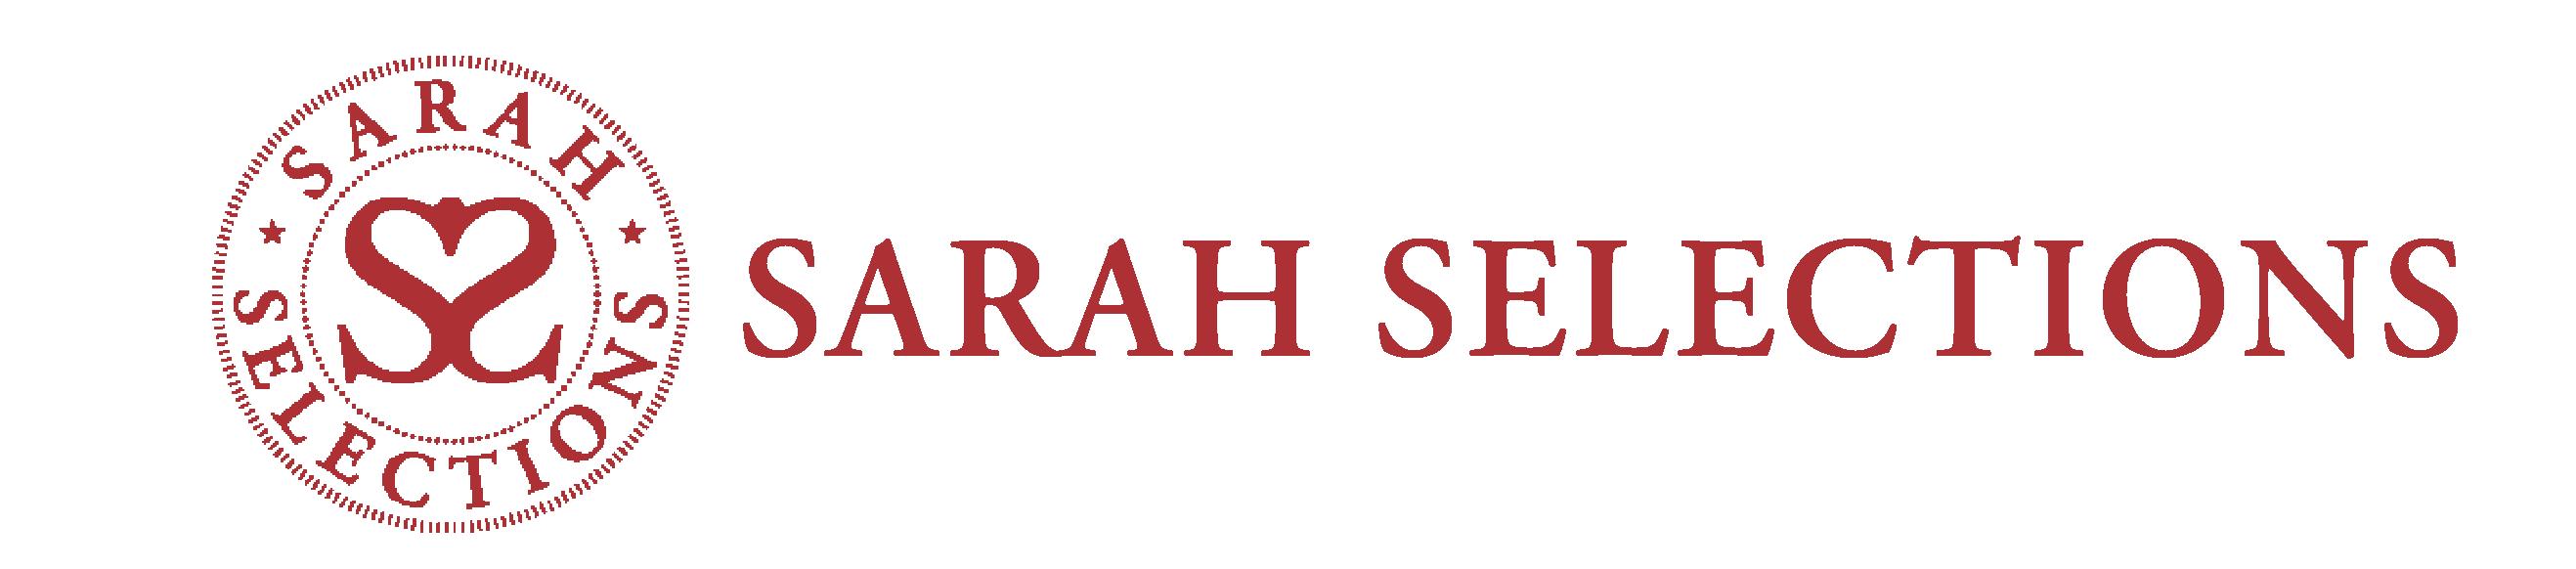 sarahselections